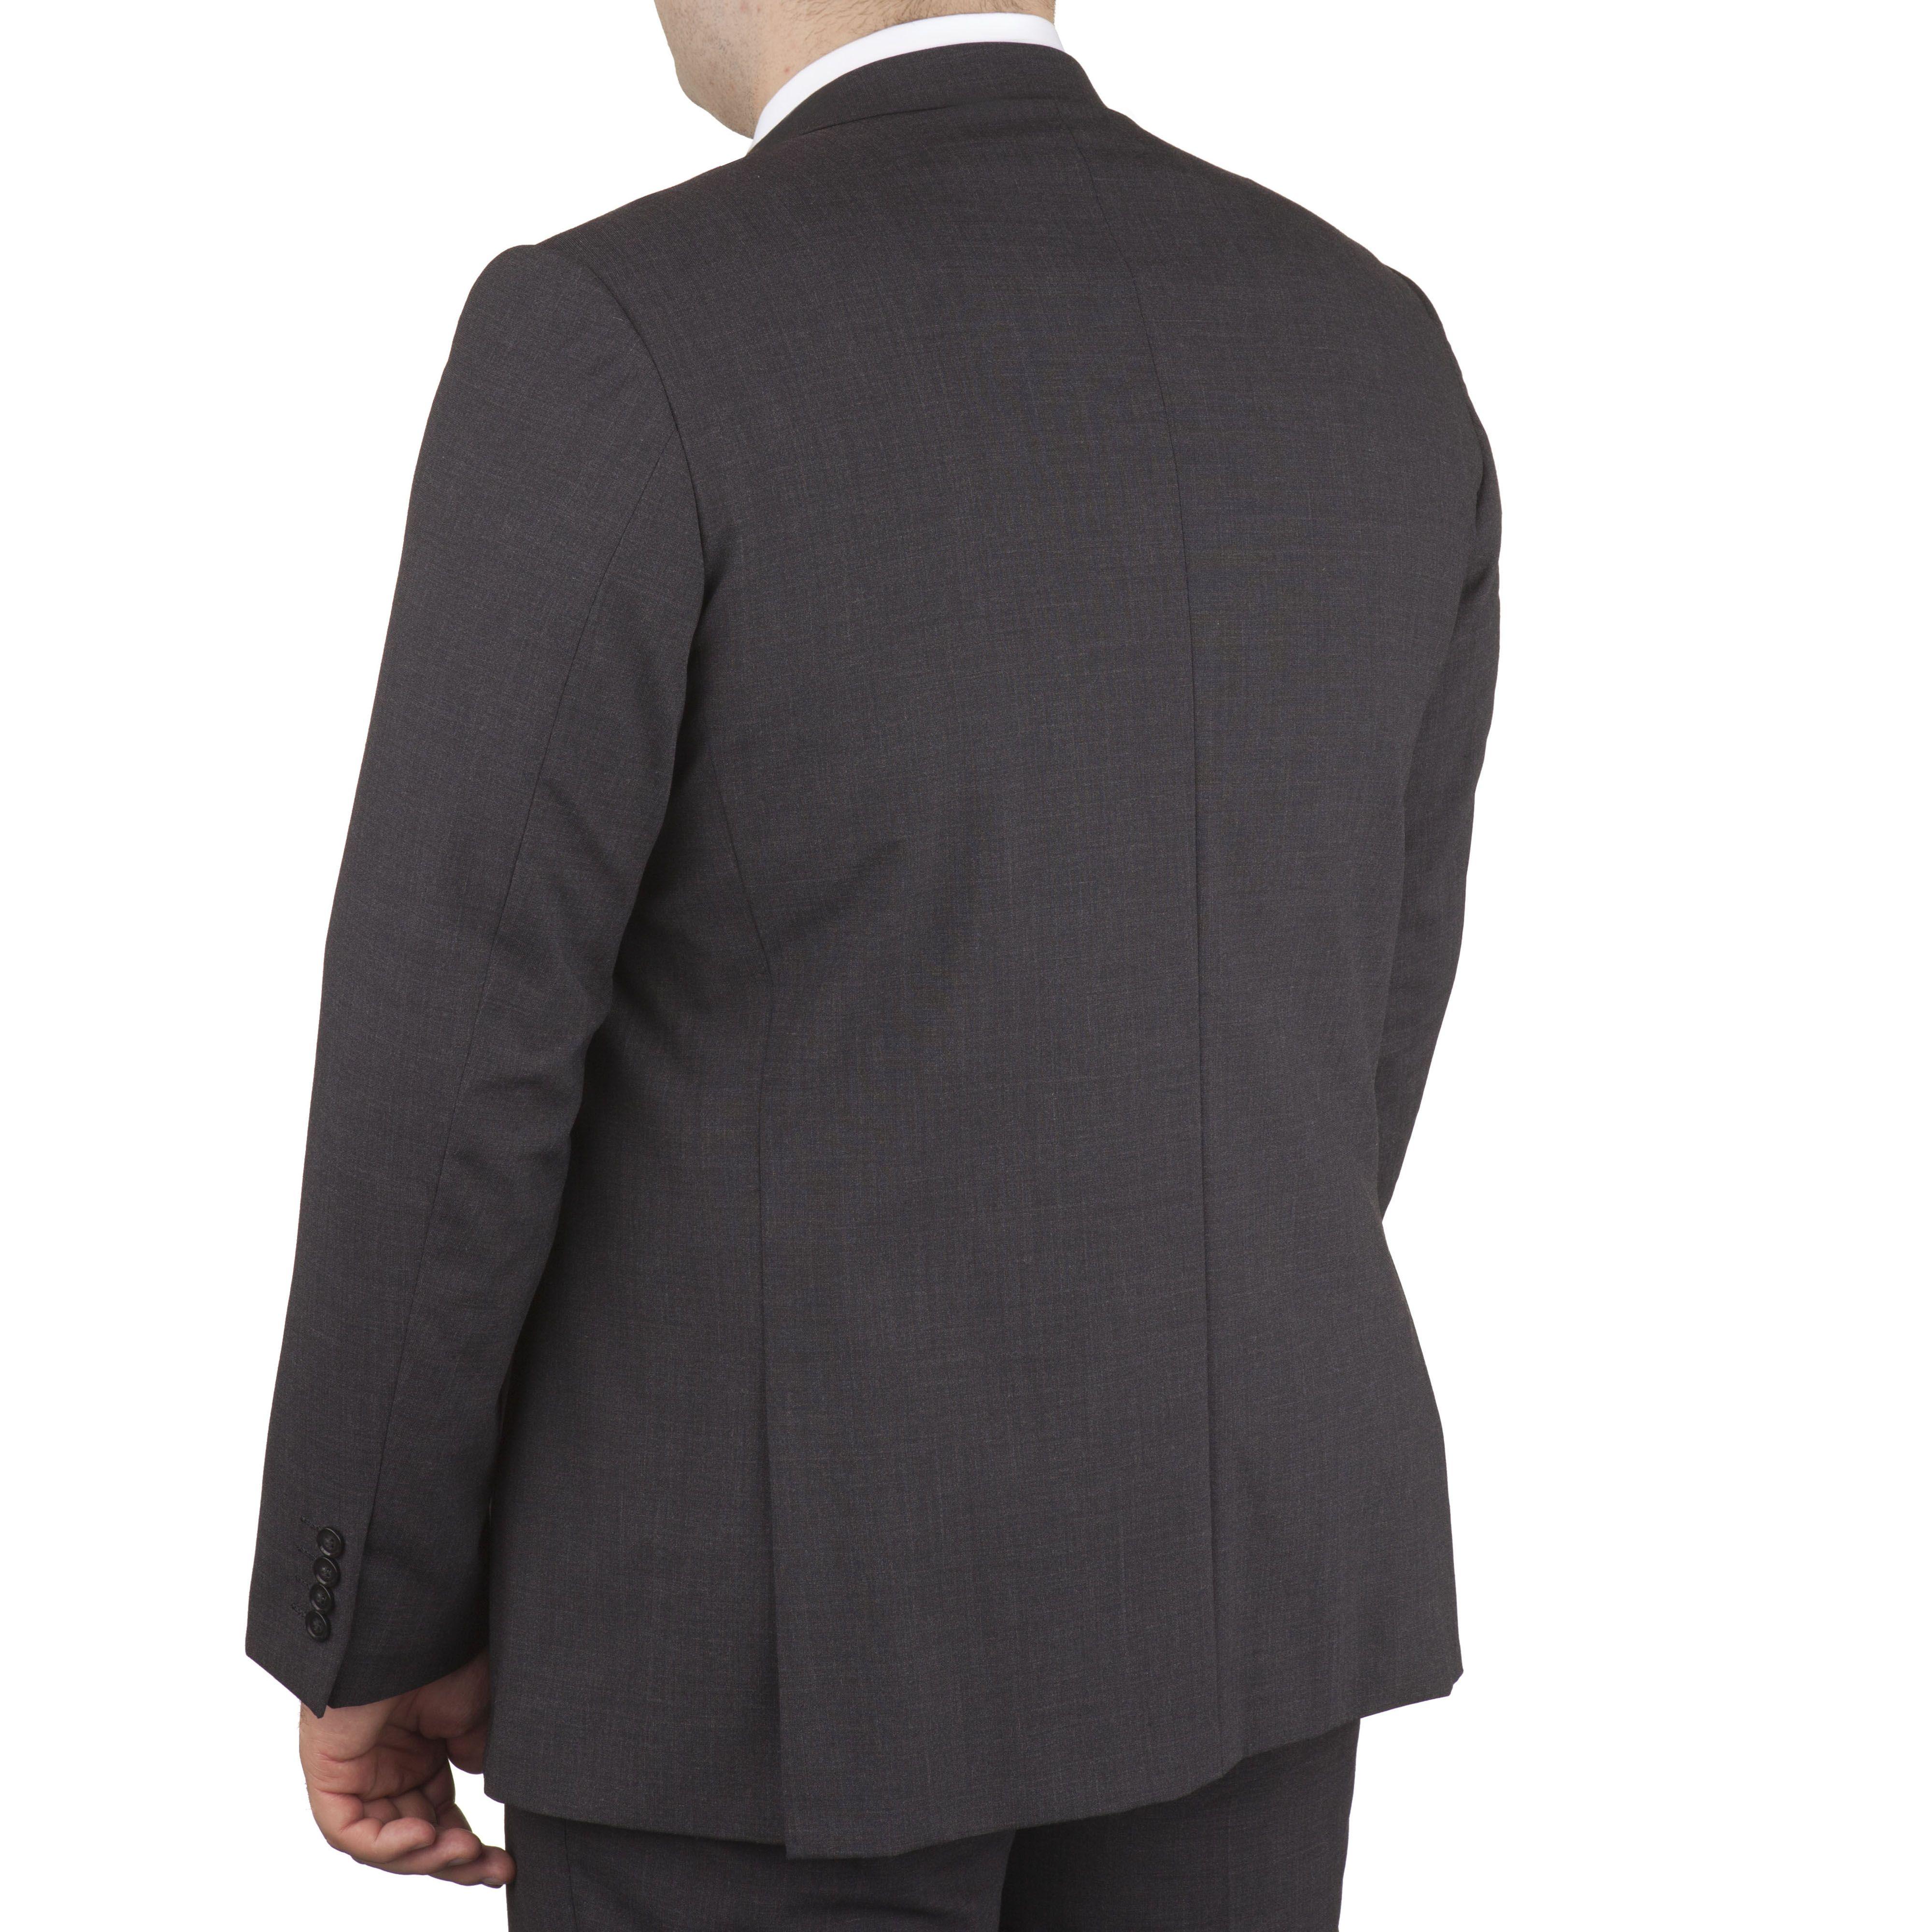 veste de costume grande taille classic gris fonc taille courte jusqu 39 au 78 skopes skopes. Black Bedroom Furniture Sets. Home Design Ideas